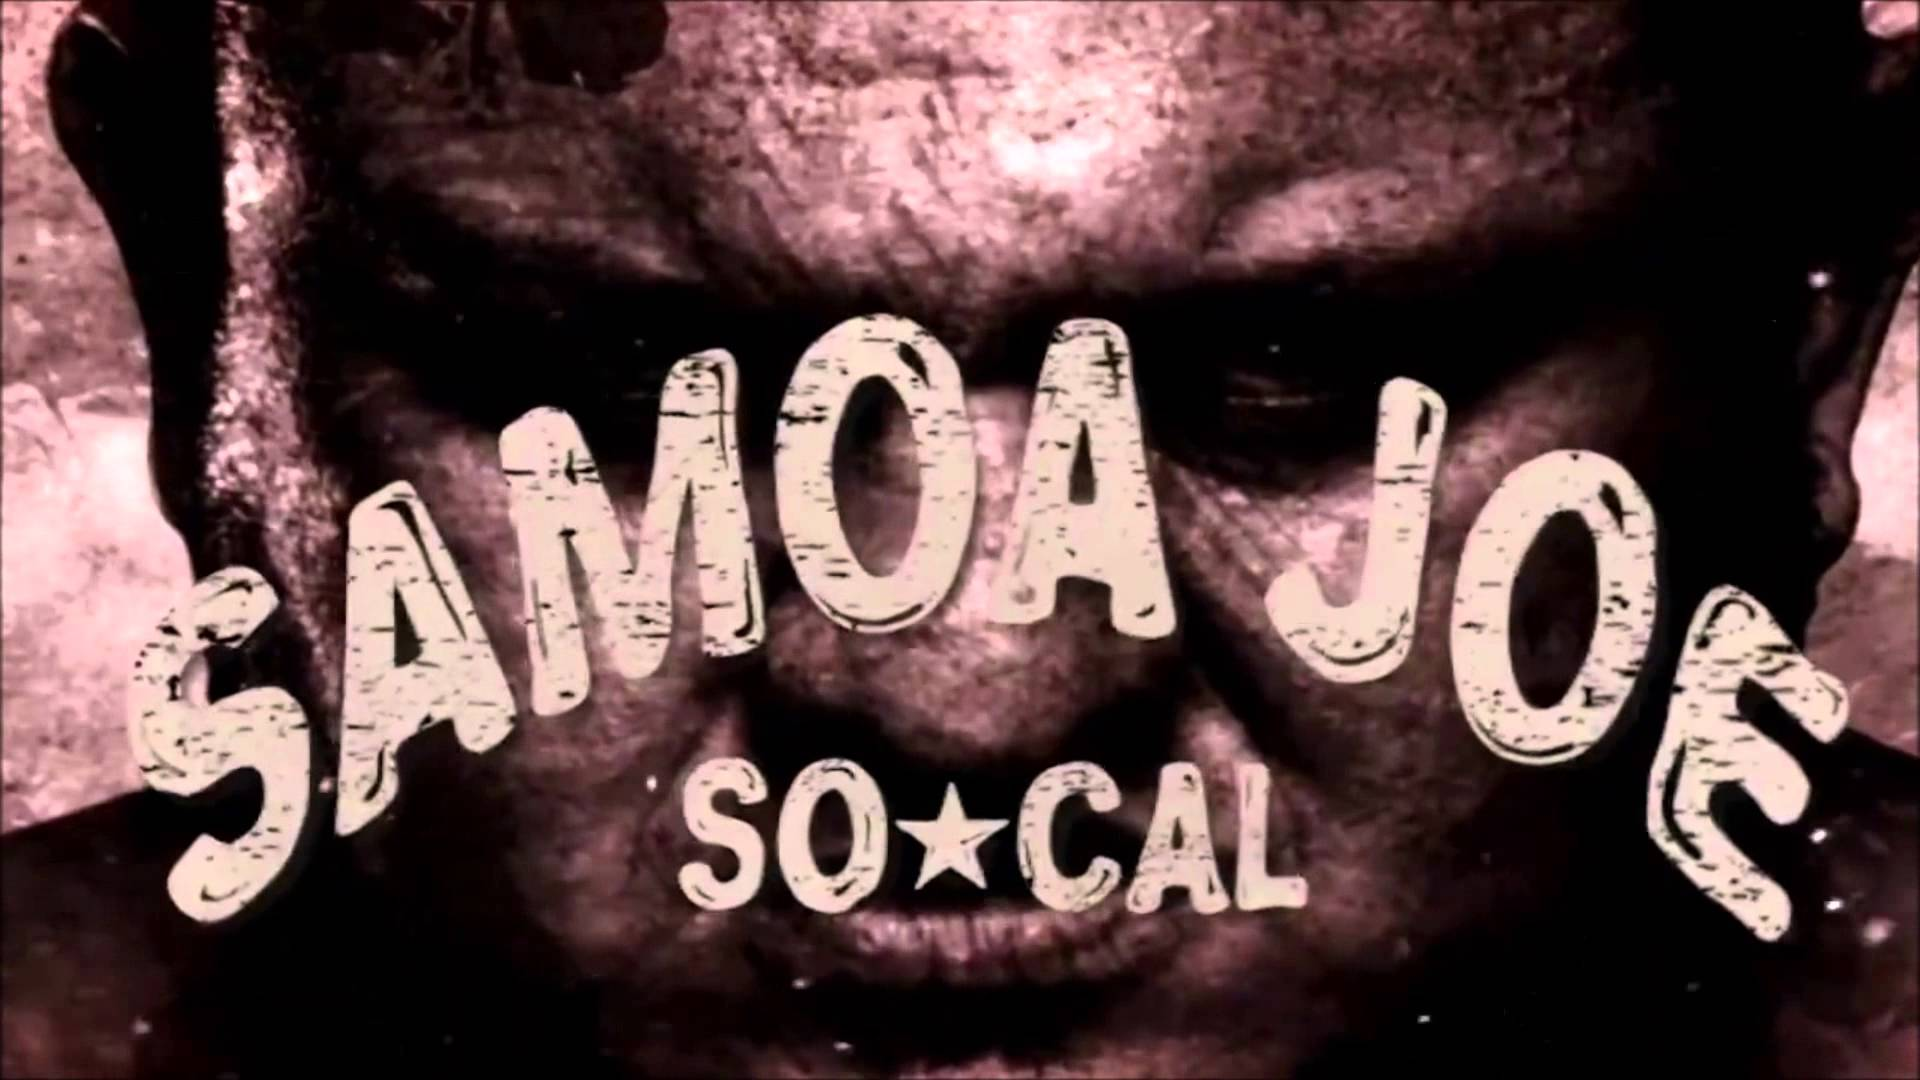 Samoa Joe Titantron 2015 2017 HD With Download Link